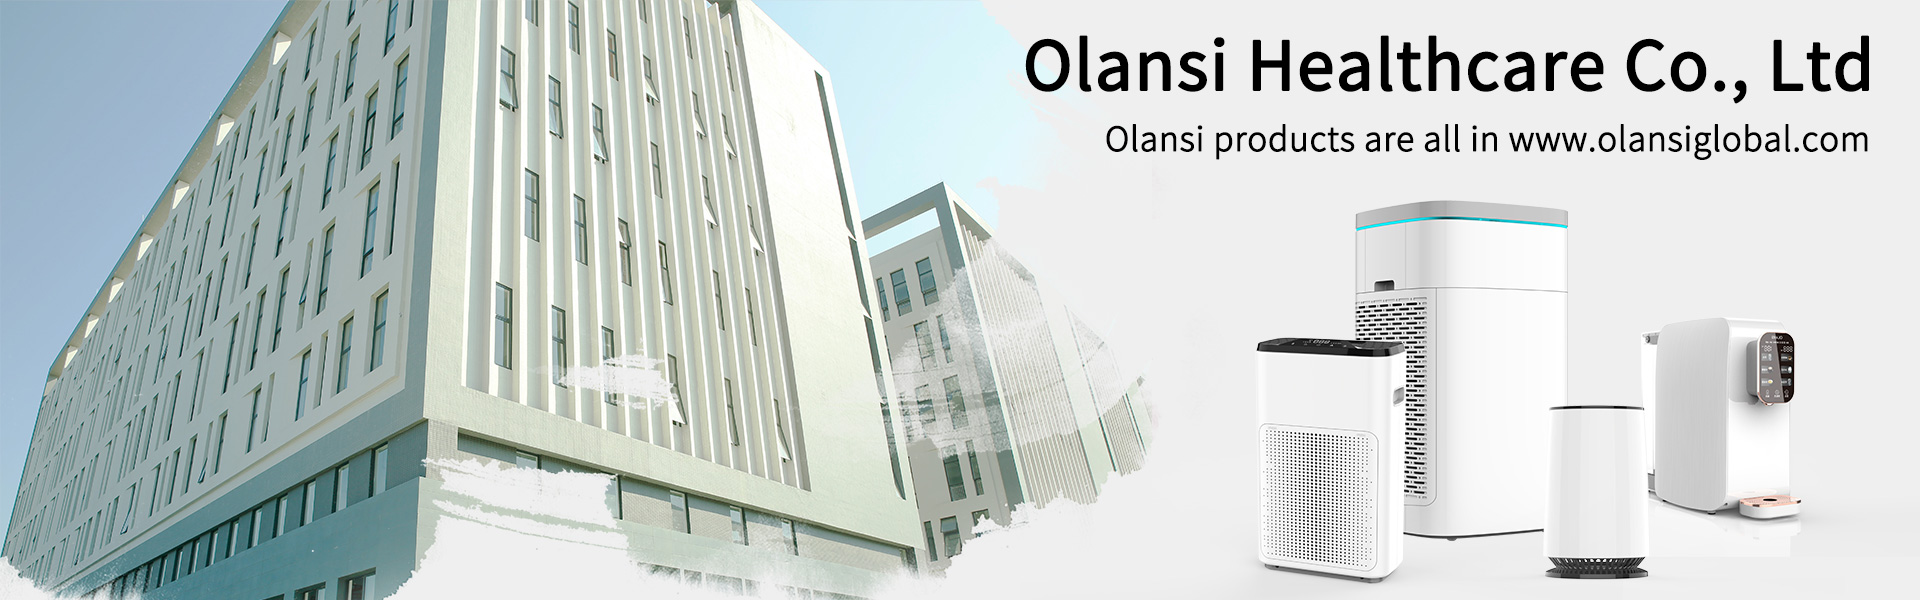 Olansi